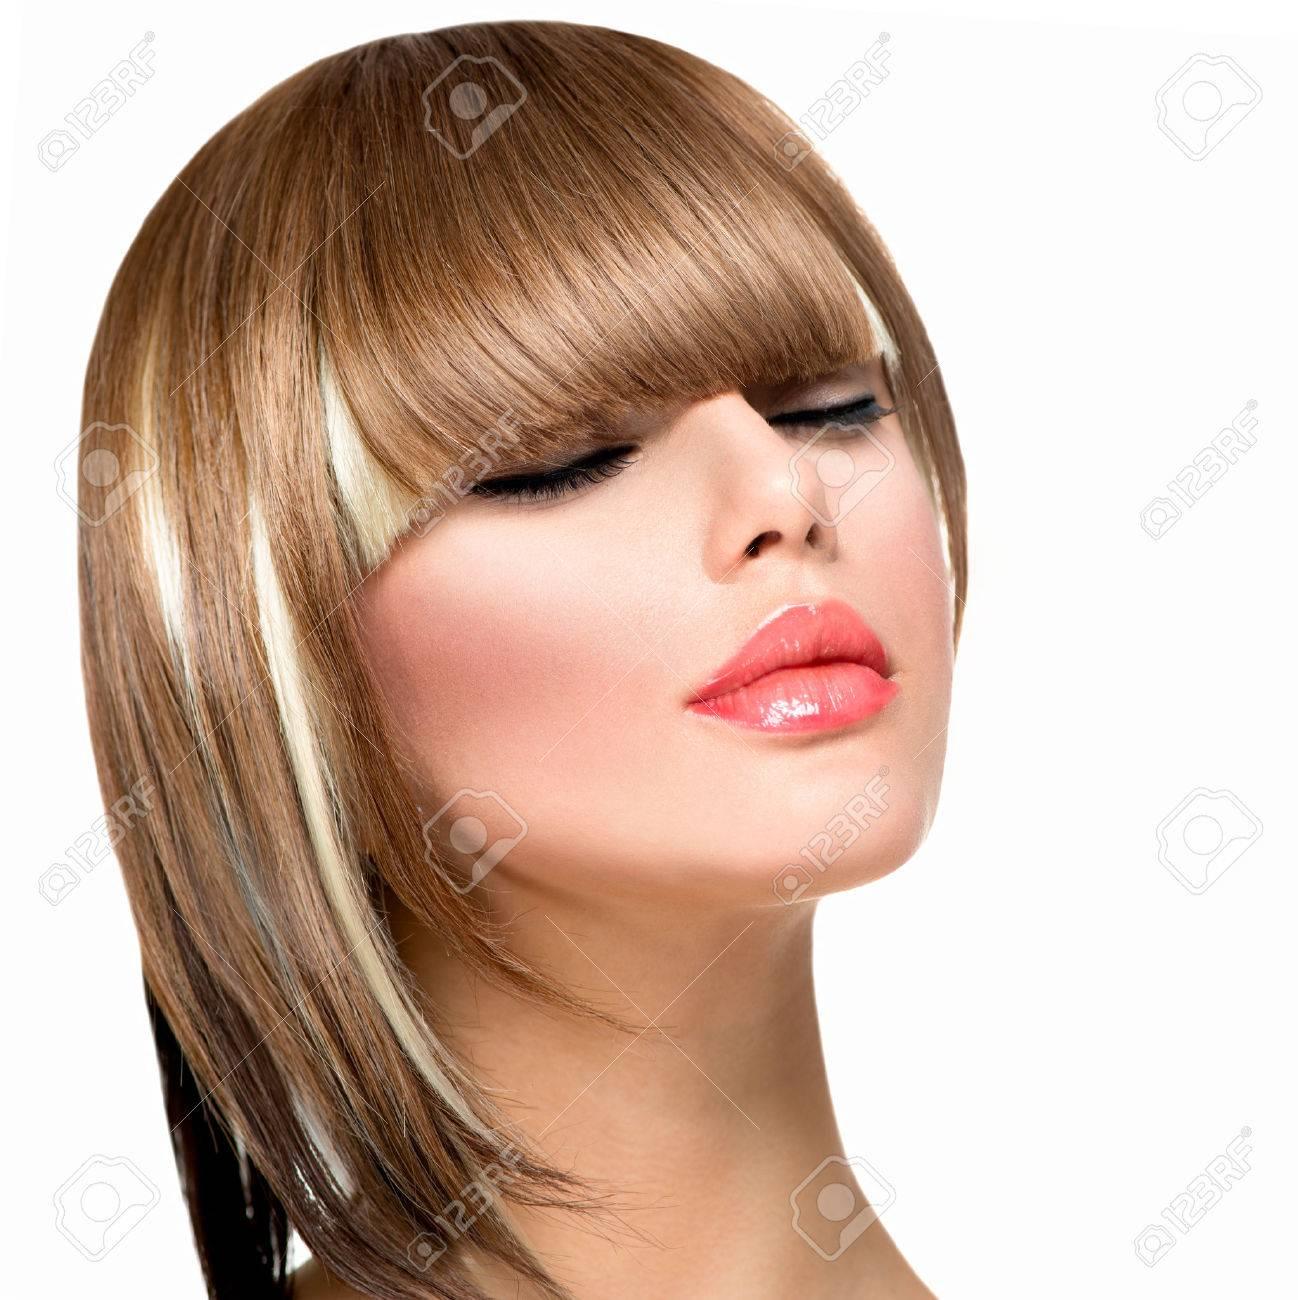 Beautiful Fashion Woman Hairstyle For Short Hair Fringe Haircut ...